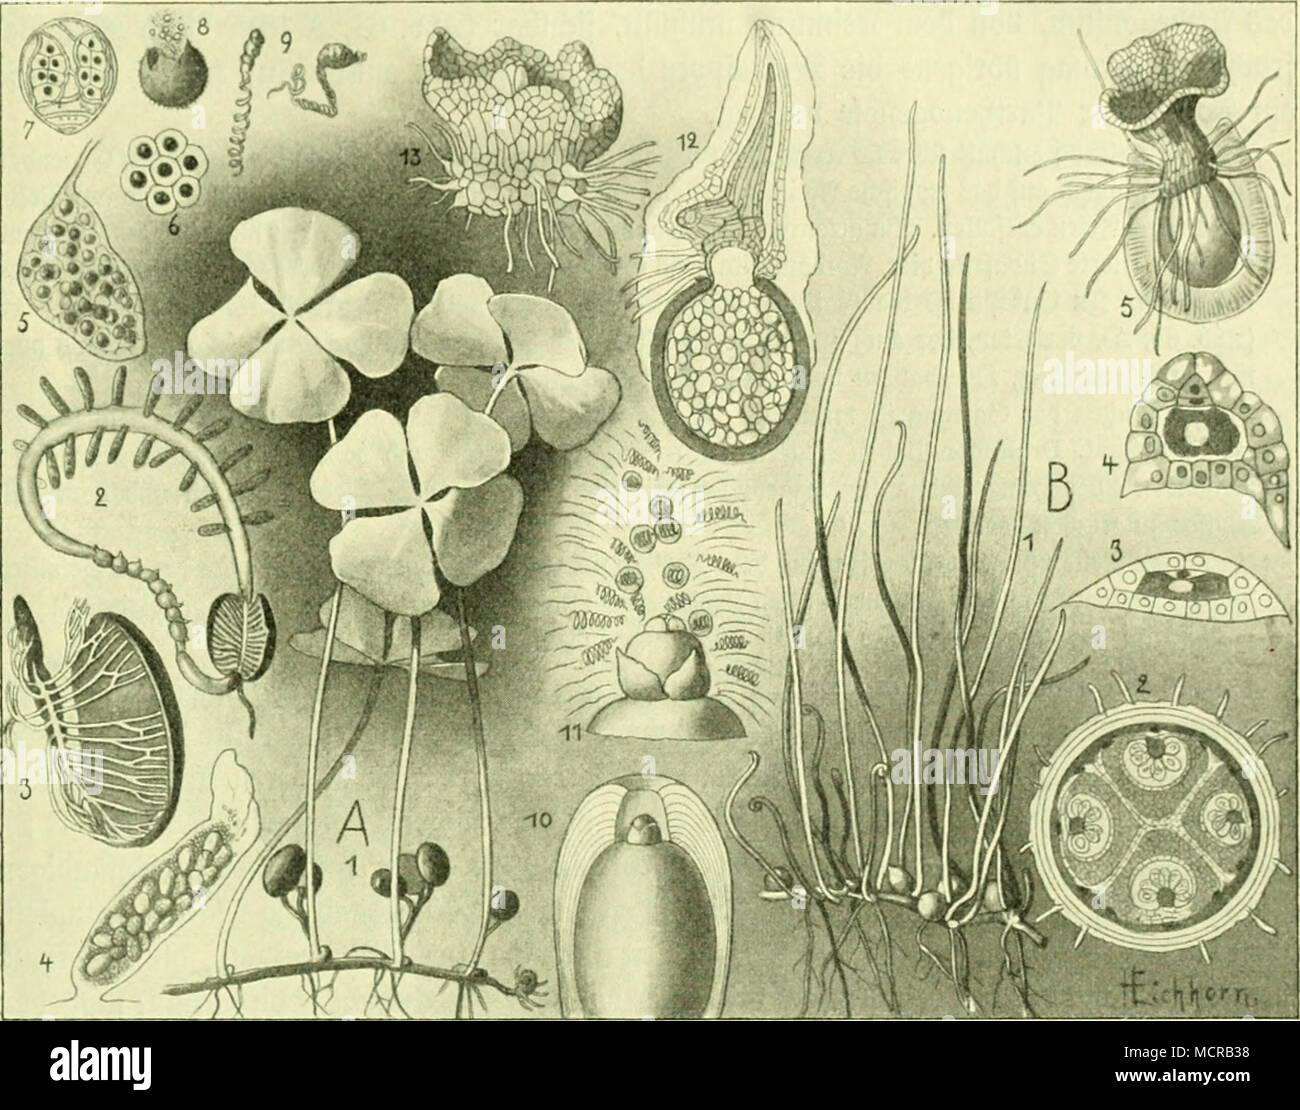 ". S(b6. 64: ^illcnfrut^tfaruc CMarsiliaceae). A)AIarsilia quadiifolia: 1) §a- fittuä; 2) aufgeiprungeneä Spovolarp mit bem bie Spo- rongienfdjläuc^e tracjenbeii ^piajentariiig, oergröpert; 3) cnticertcä epoiotavp, um bie Oefttpbunbeloeräuieigung ju jeigen; 4) epovangien? fc^taud) tiüt (Ijcllen) Watros fporangicu unb (bunfteii) aJUfrofporaugien; 5) 2)li£ro= fpoiaiigiuiii; ö) a)tifro[poi-eii; 7) aUh-cfpore im 2;iivcf;[d;uitt mit 5J>voti)aUium unb äiuci Stnt^eribtcn; 8) ©ntteerung ber Spermntoäoiibeu aus ber ÜJUfrofporc; 9) Speniiatos joTbeii; 10) SDfafcofporo mit -^.""apiUe unb ^ecfid)id; Stock Photo"